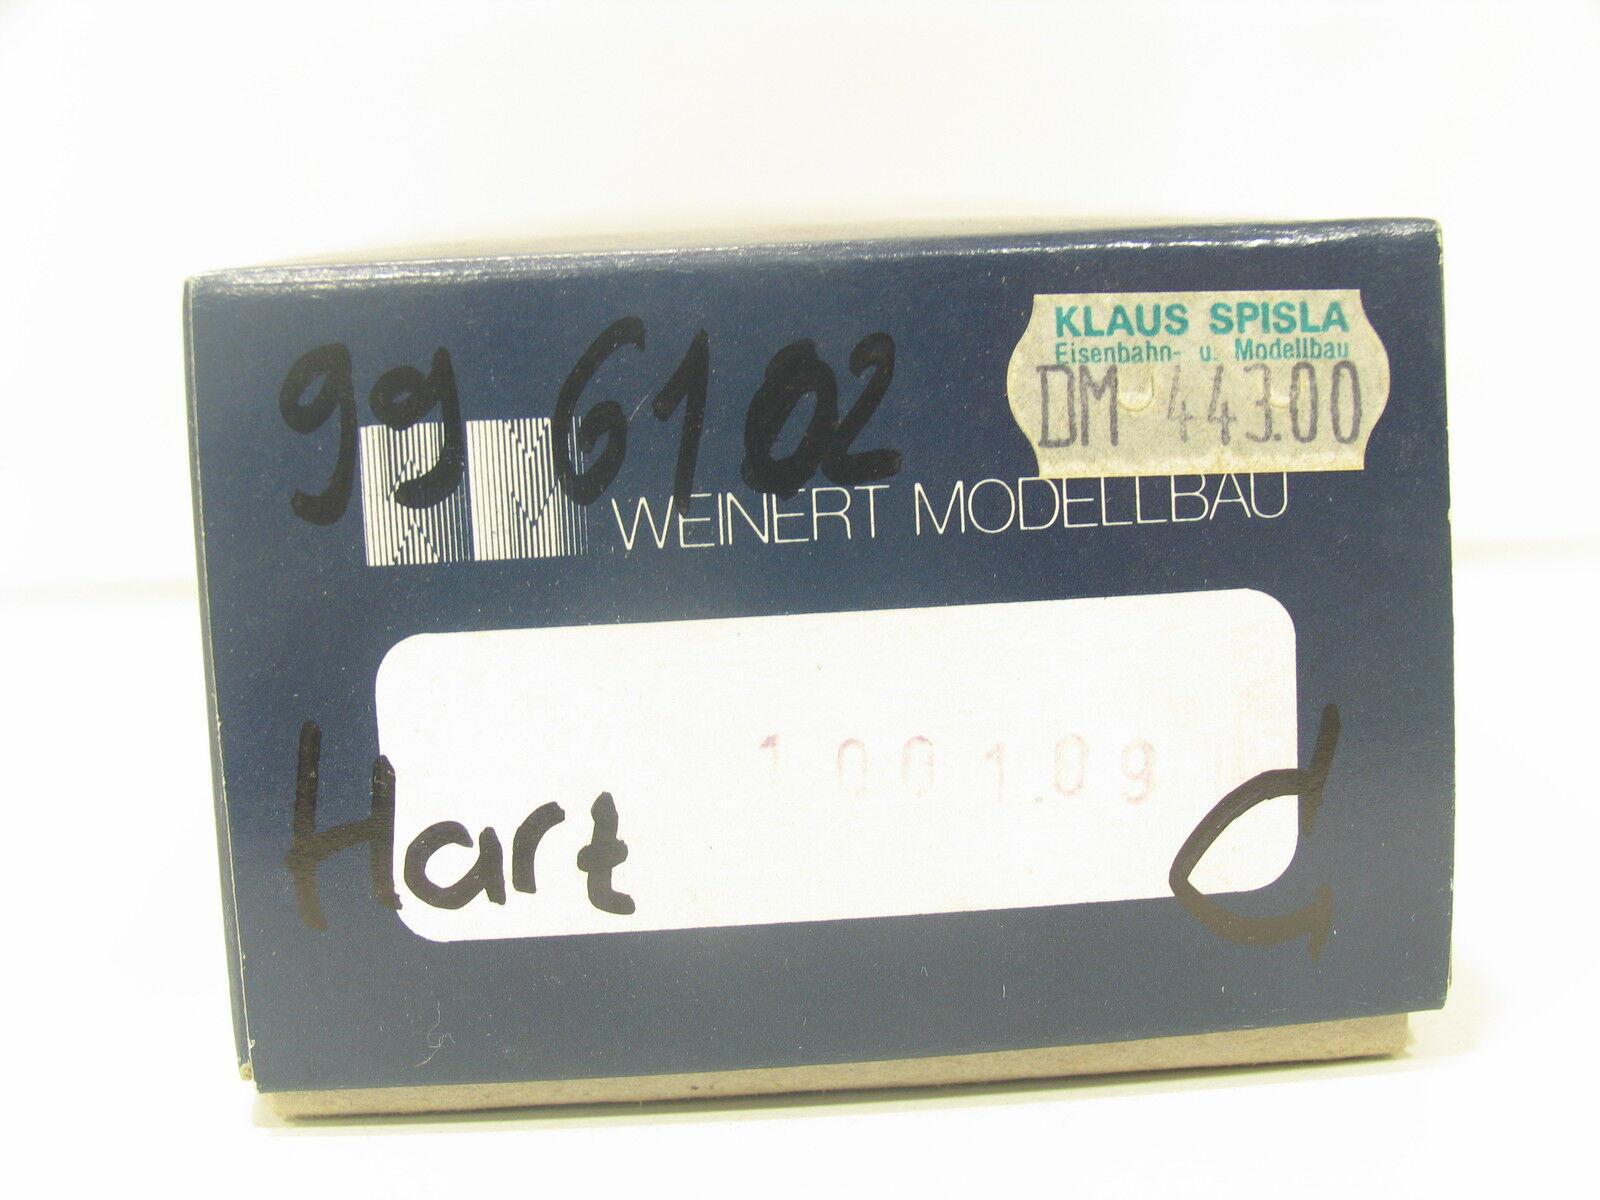 Weinert 100 109 metal kit h0e máquina de vapor 996102 resina transversales ferrocarril bw913